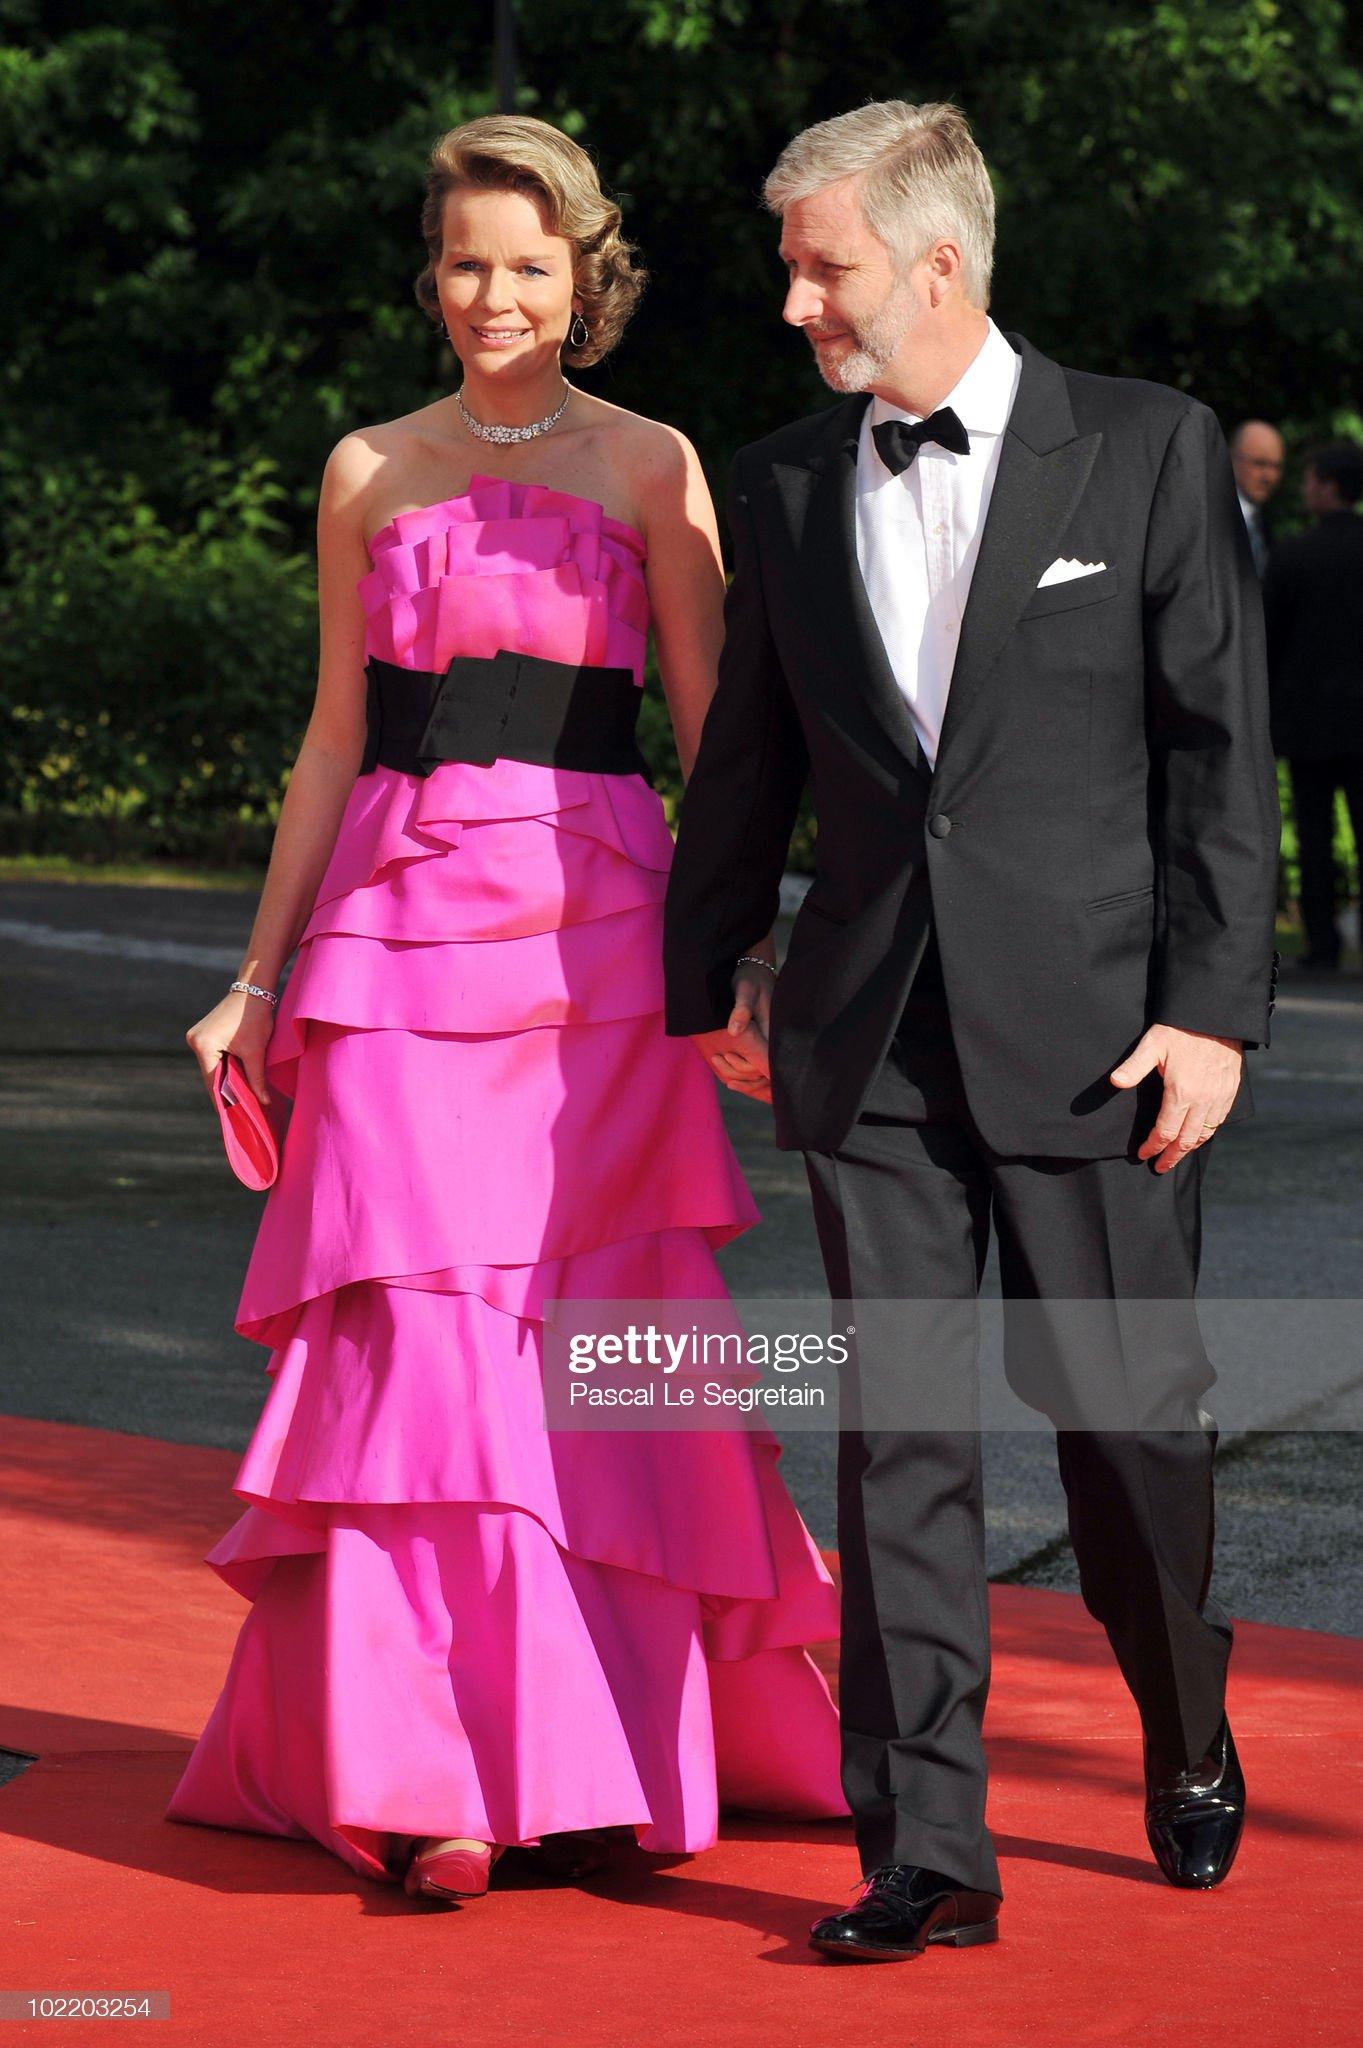 Вечерние наряды Королевы Матильды Crown Princess Victoria & Daniel Westling: Pre Wedding Dinner - Arrivals : News Photo